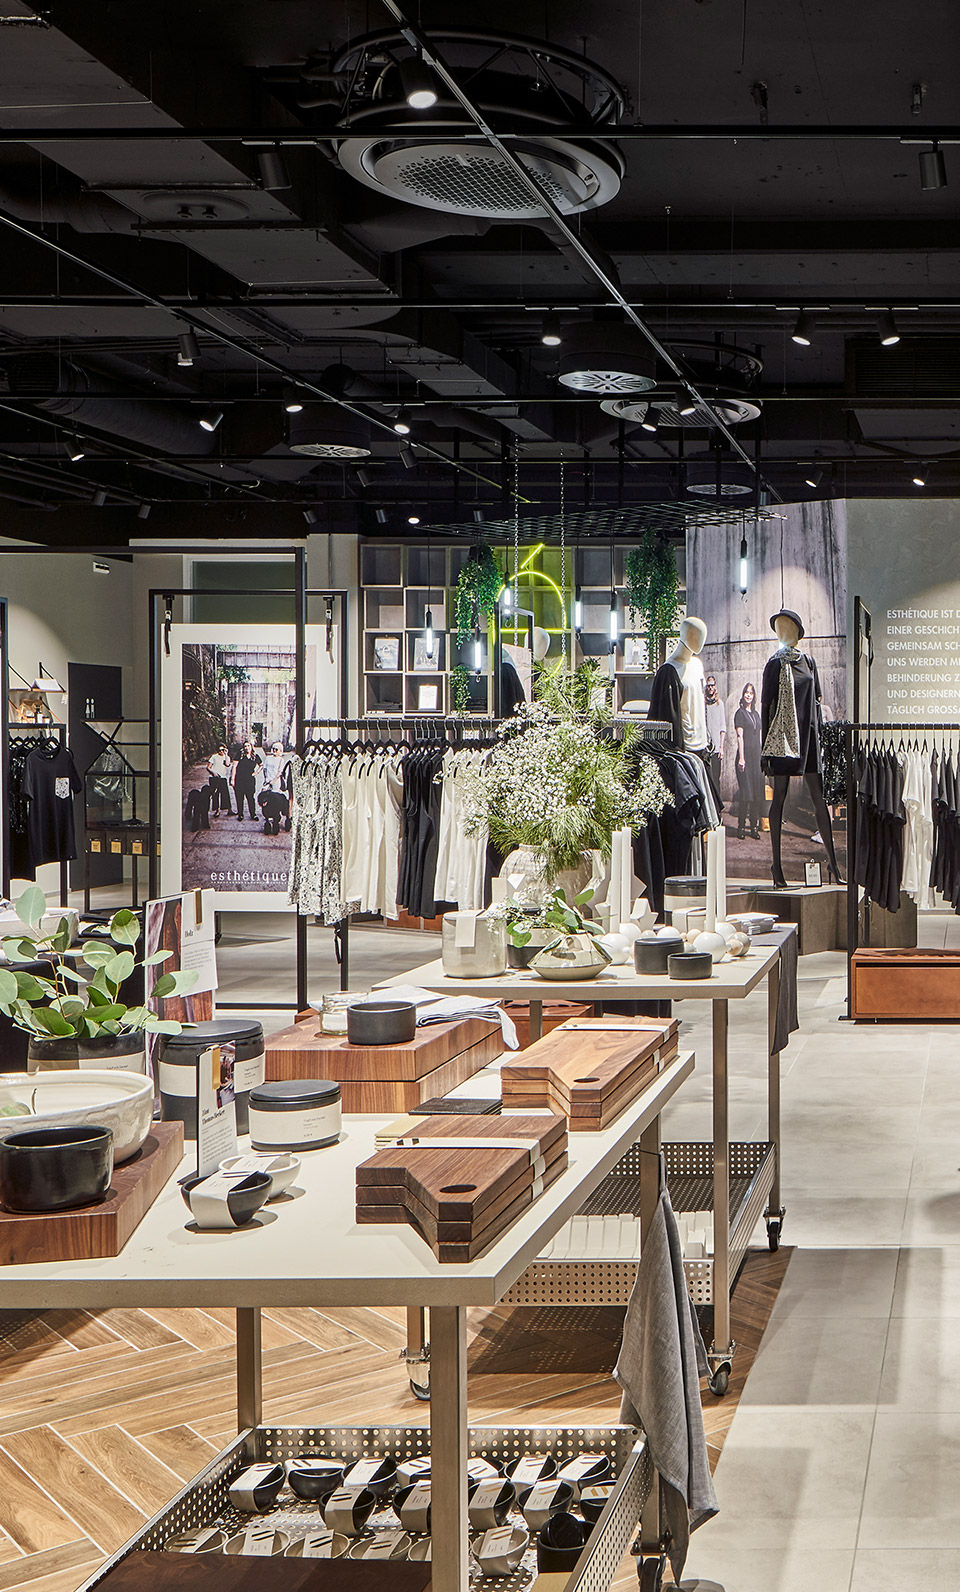 Av Concept Store - Warenlegung